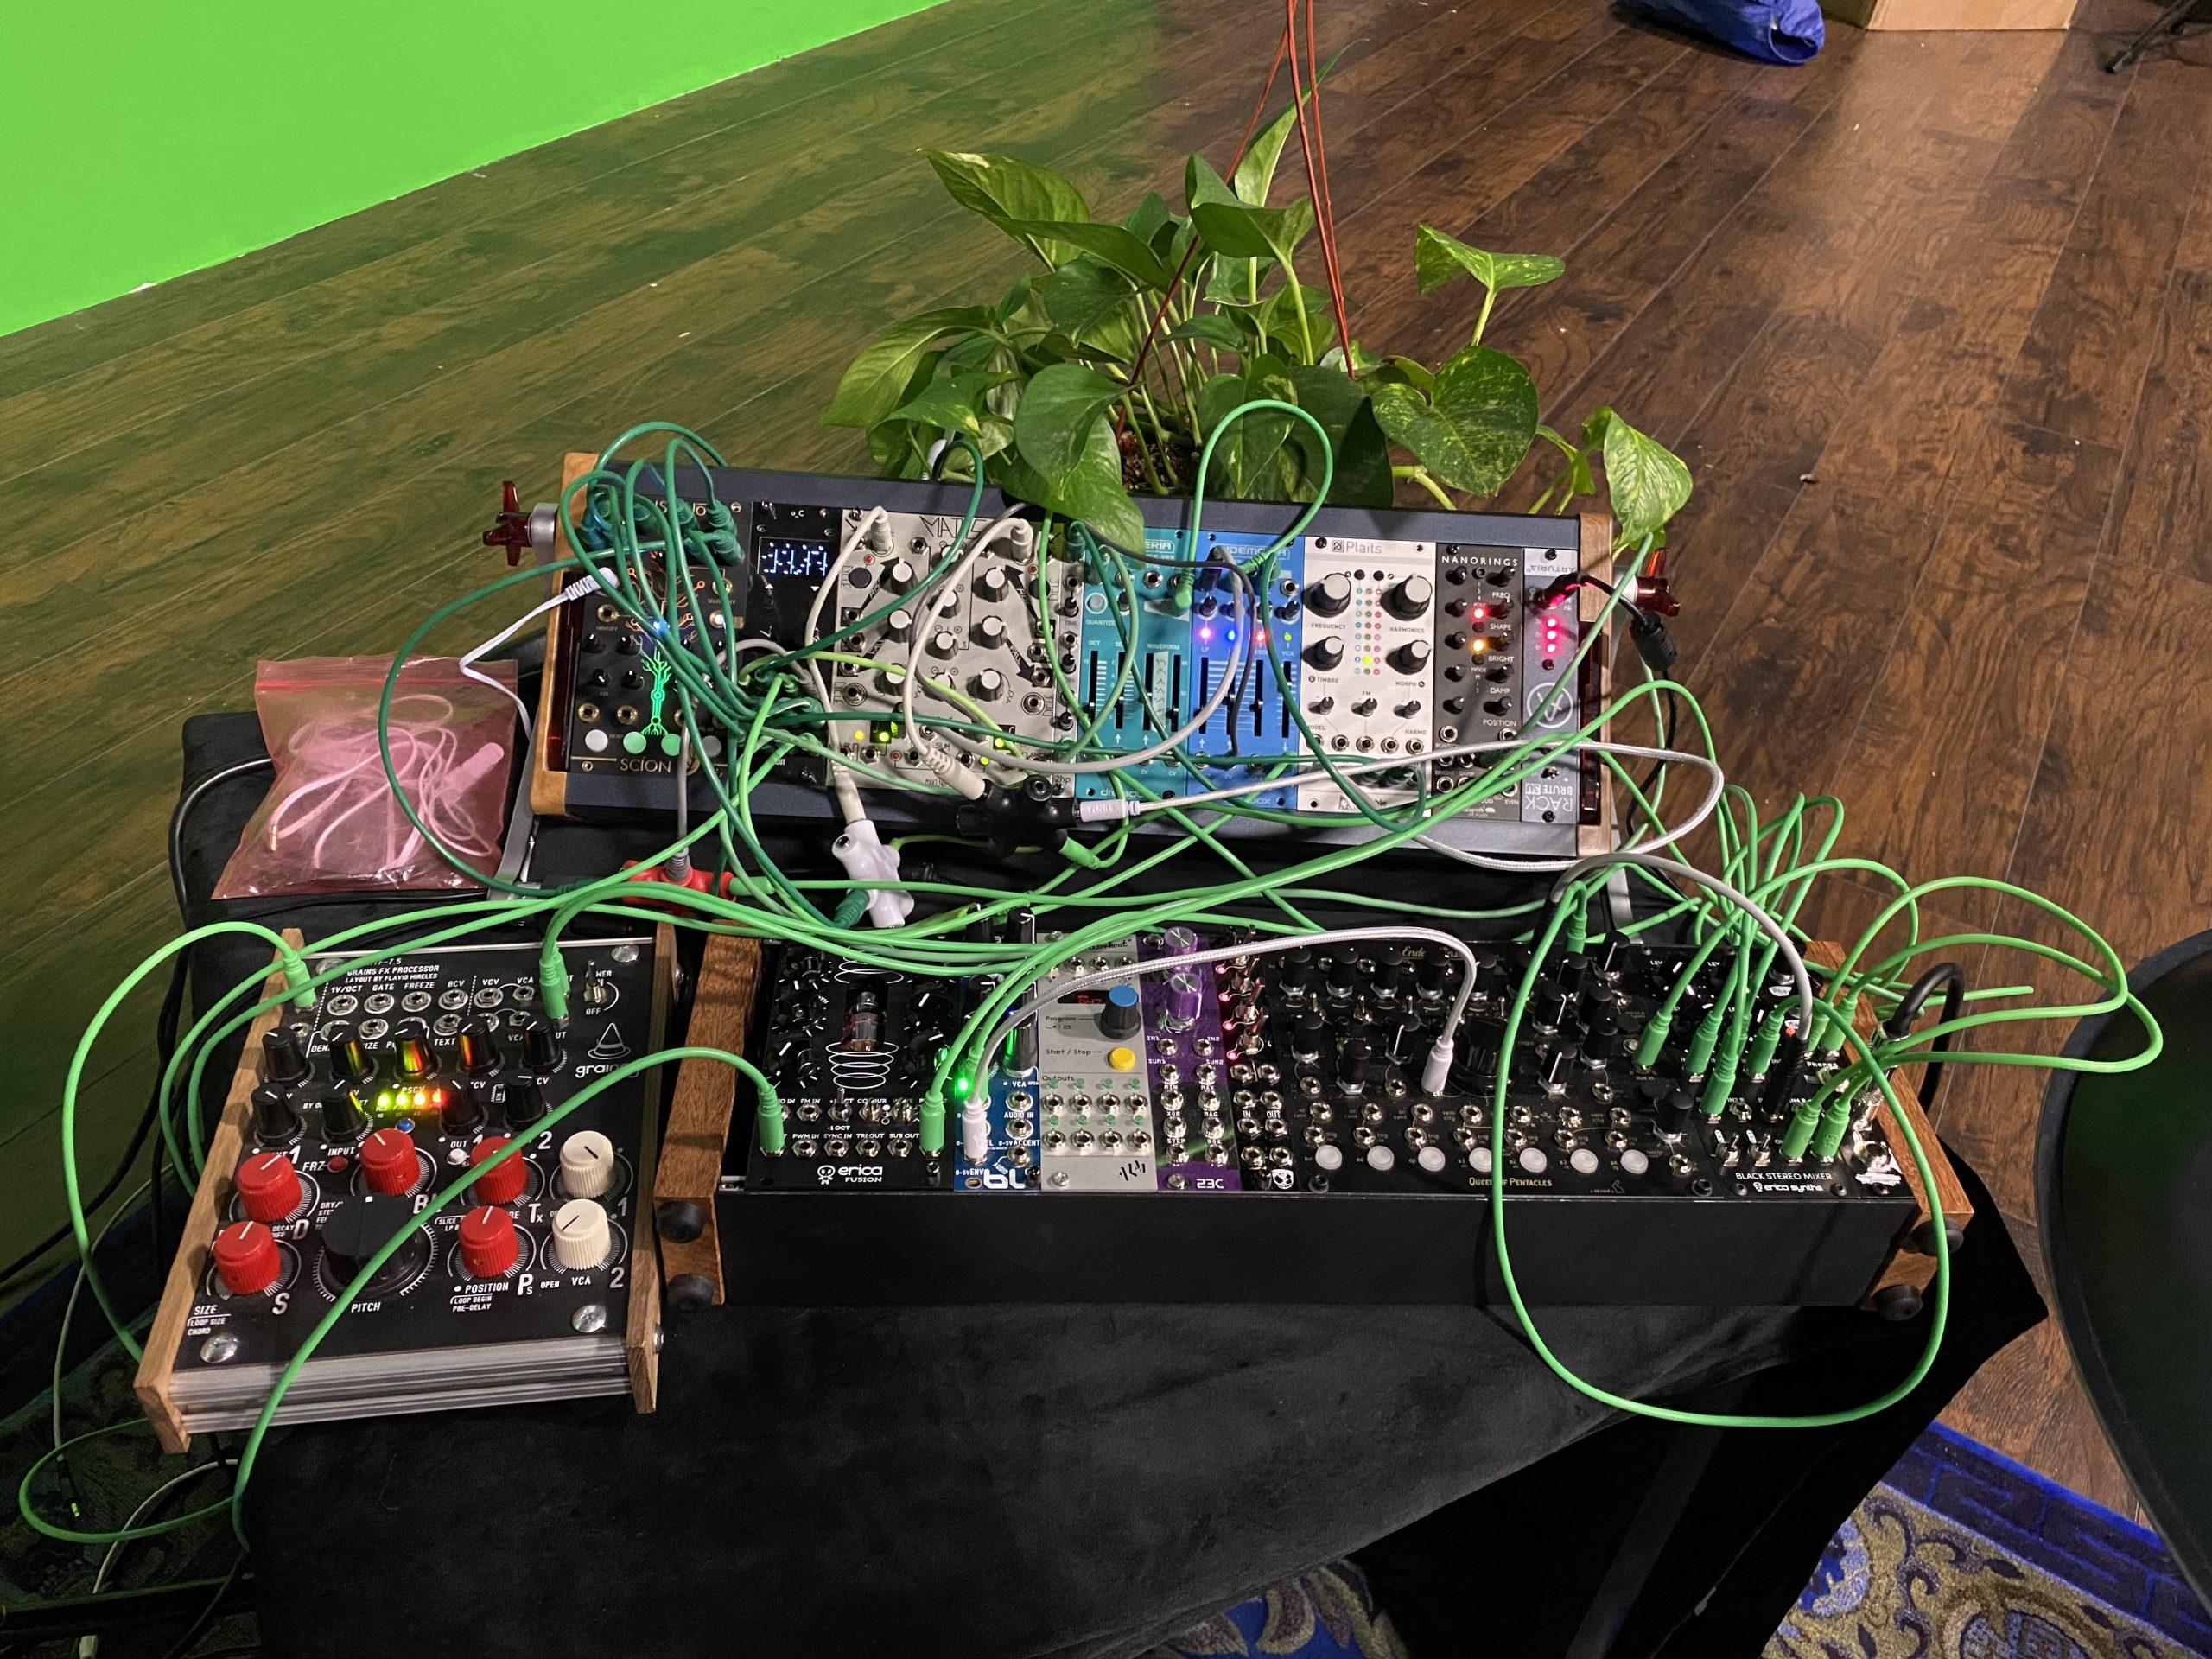 Eurorack modules connected to a Biofeedback sensor